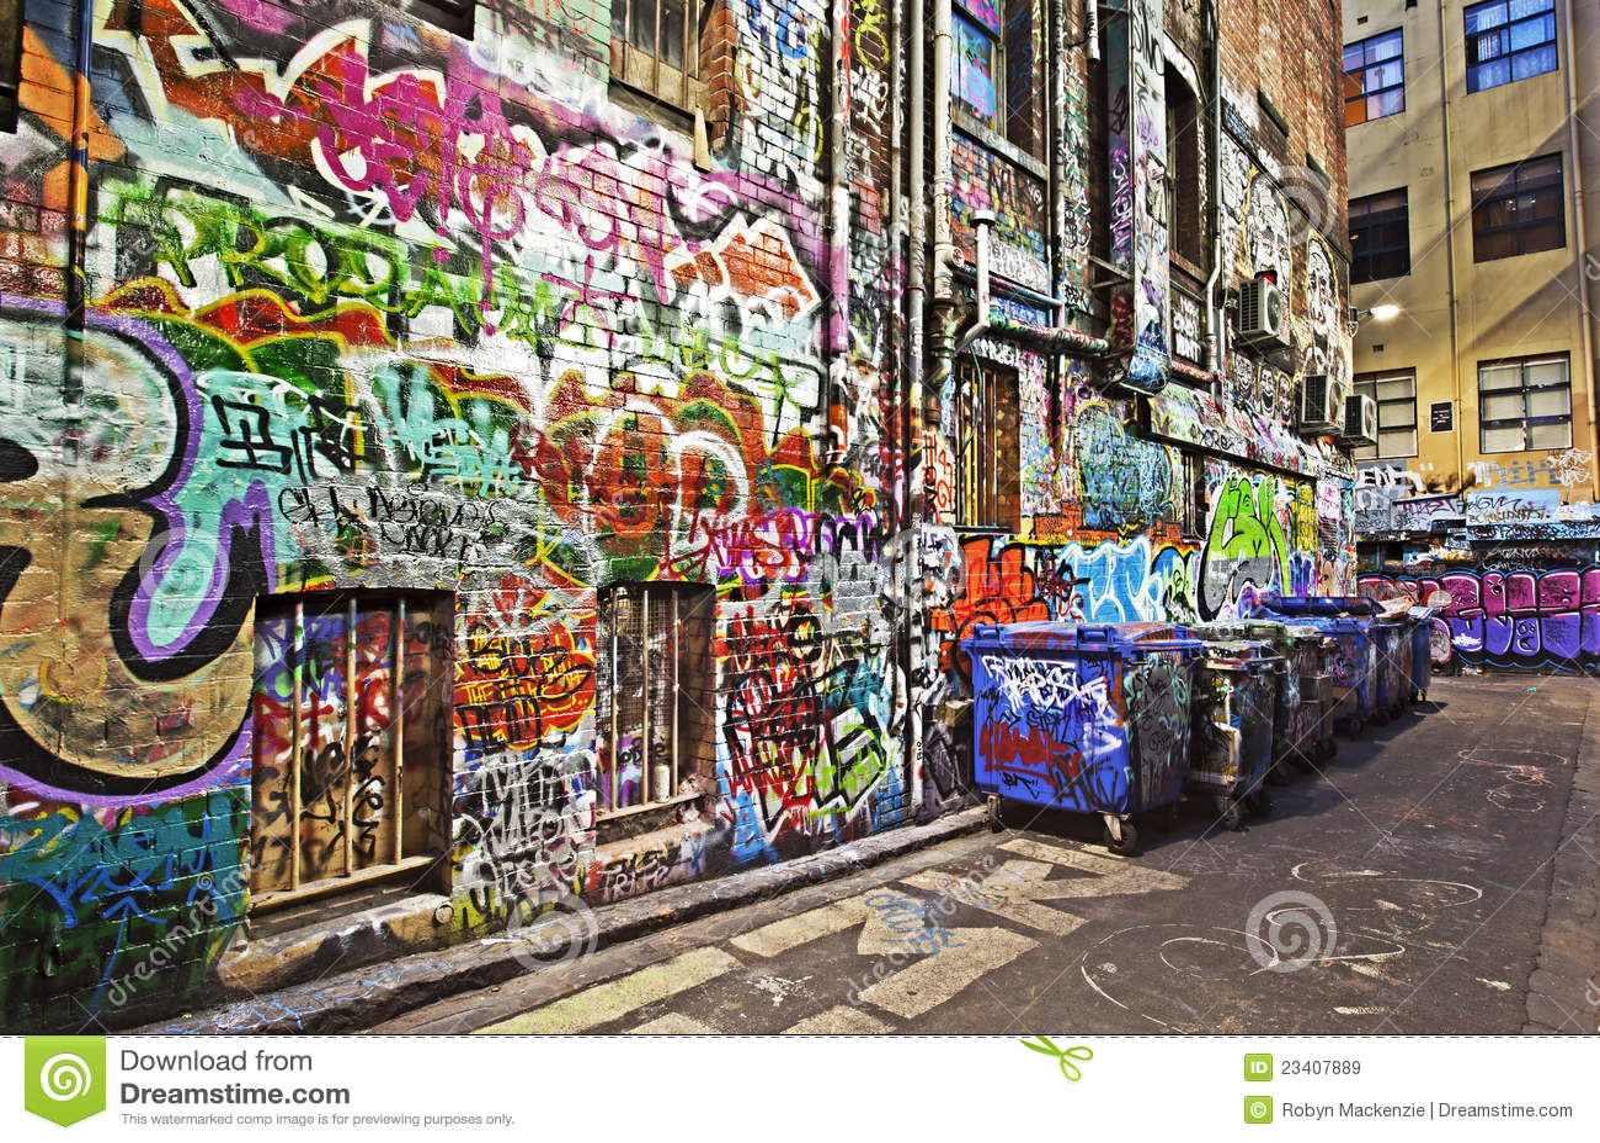 graffiti stockbild bild von m llcontainer melbourne. Black Bedroom Furniture Sets. Home Design Ideas